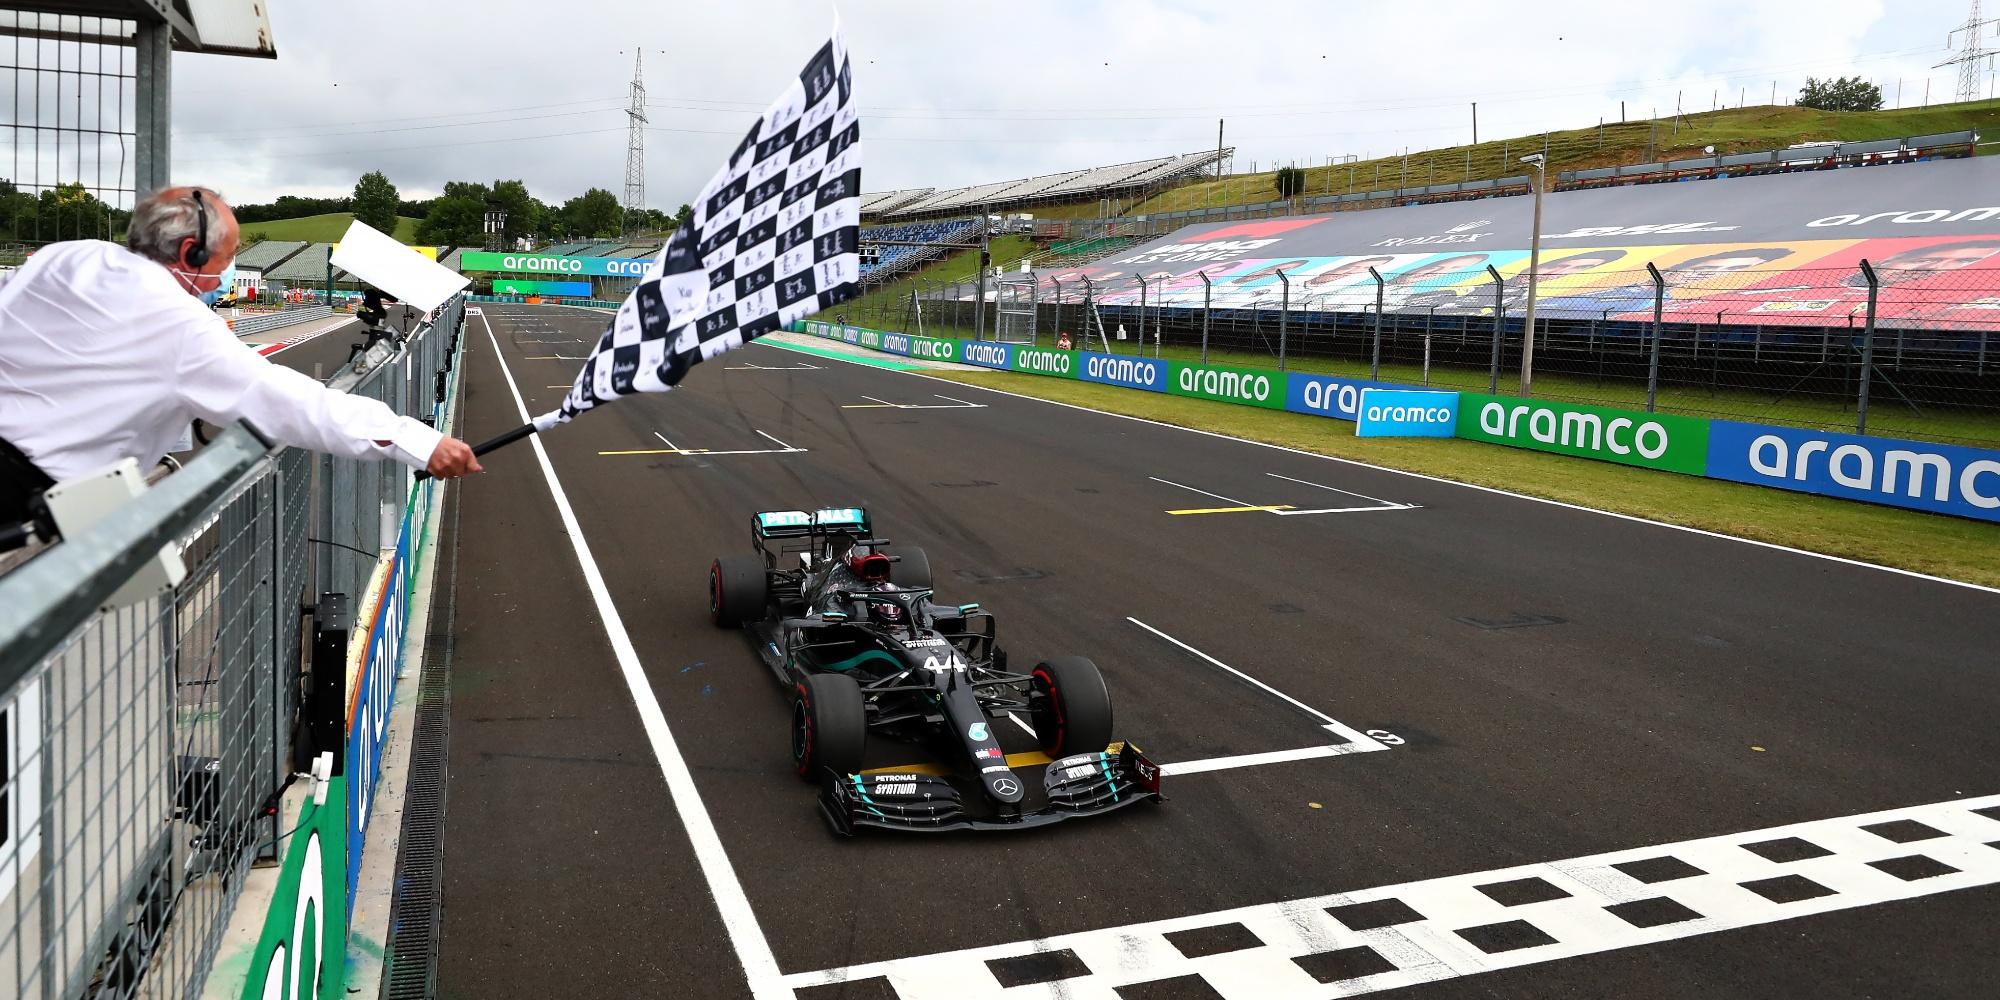 Lewis Hamilton, 2020 Hungarian GP